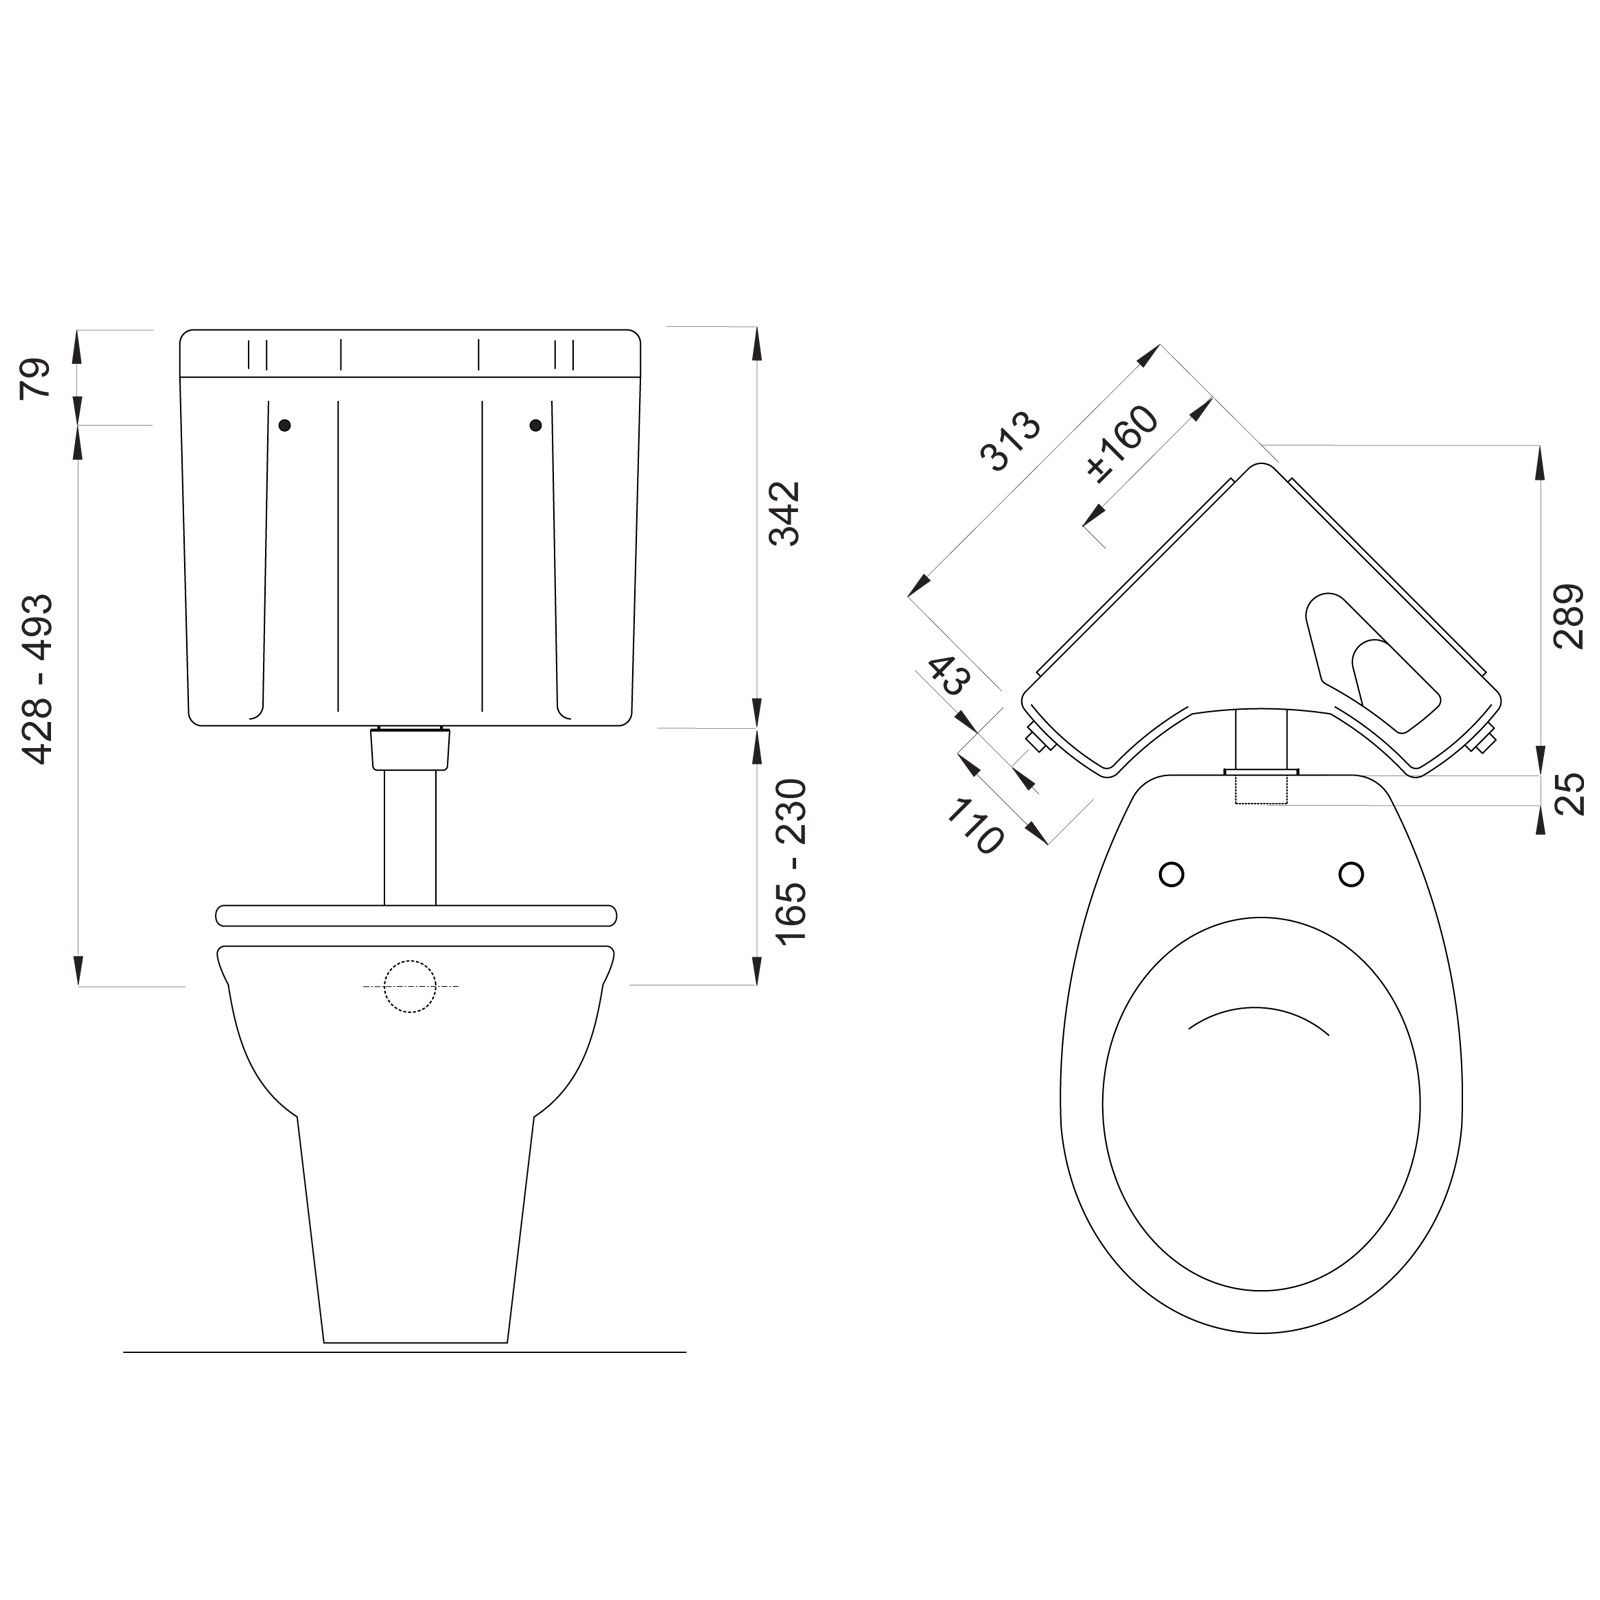 wisa 770 aufputz ecksp lkasten sp lkasten toilettensp lkasten sp lung 6 9 l wei. Black Bedroom Furniture Sets. Home Design Ideas